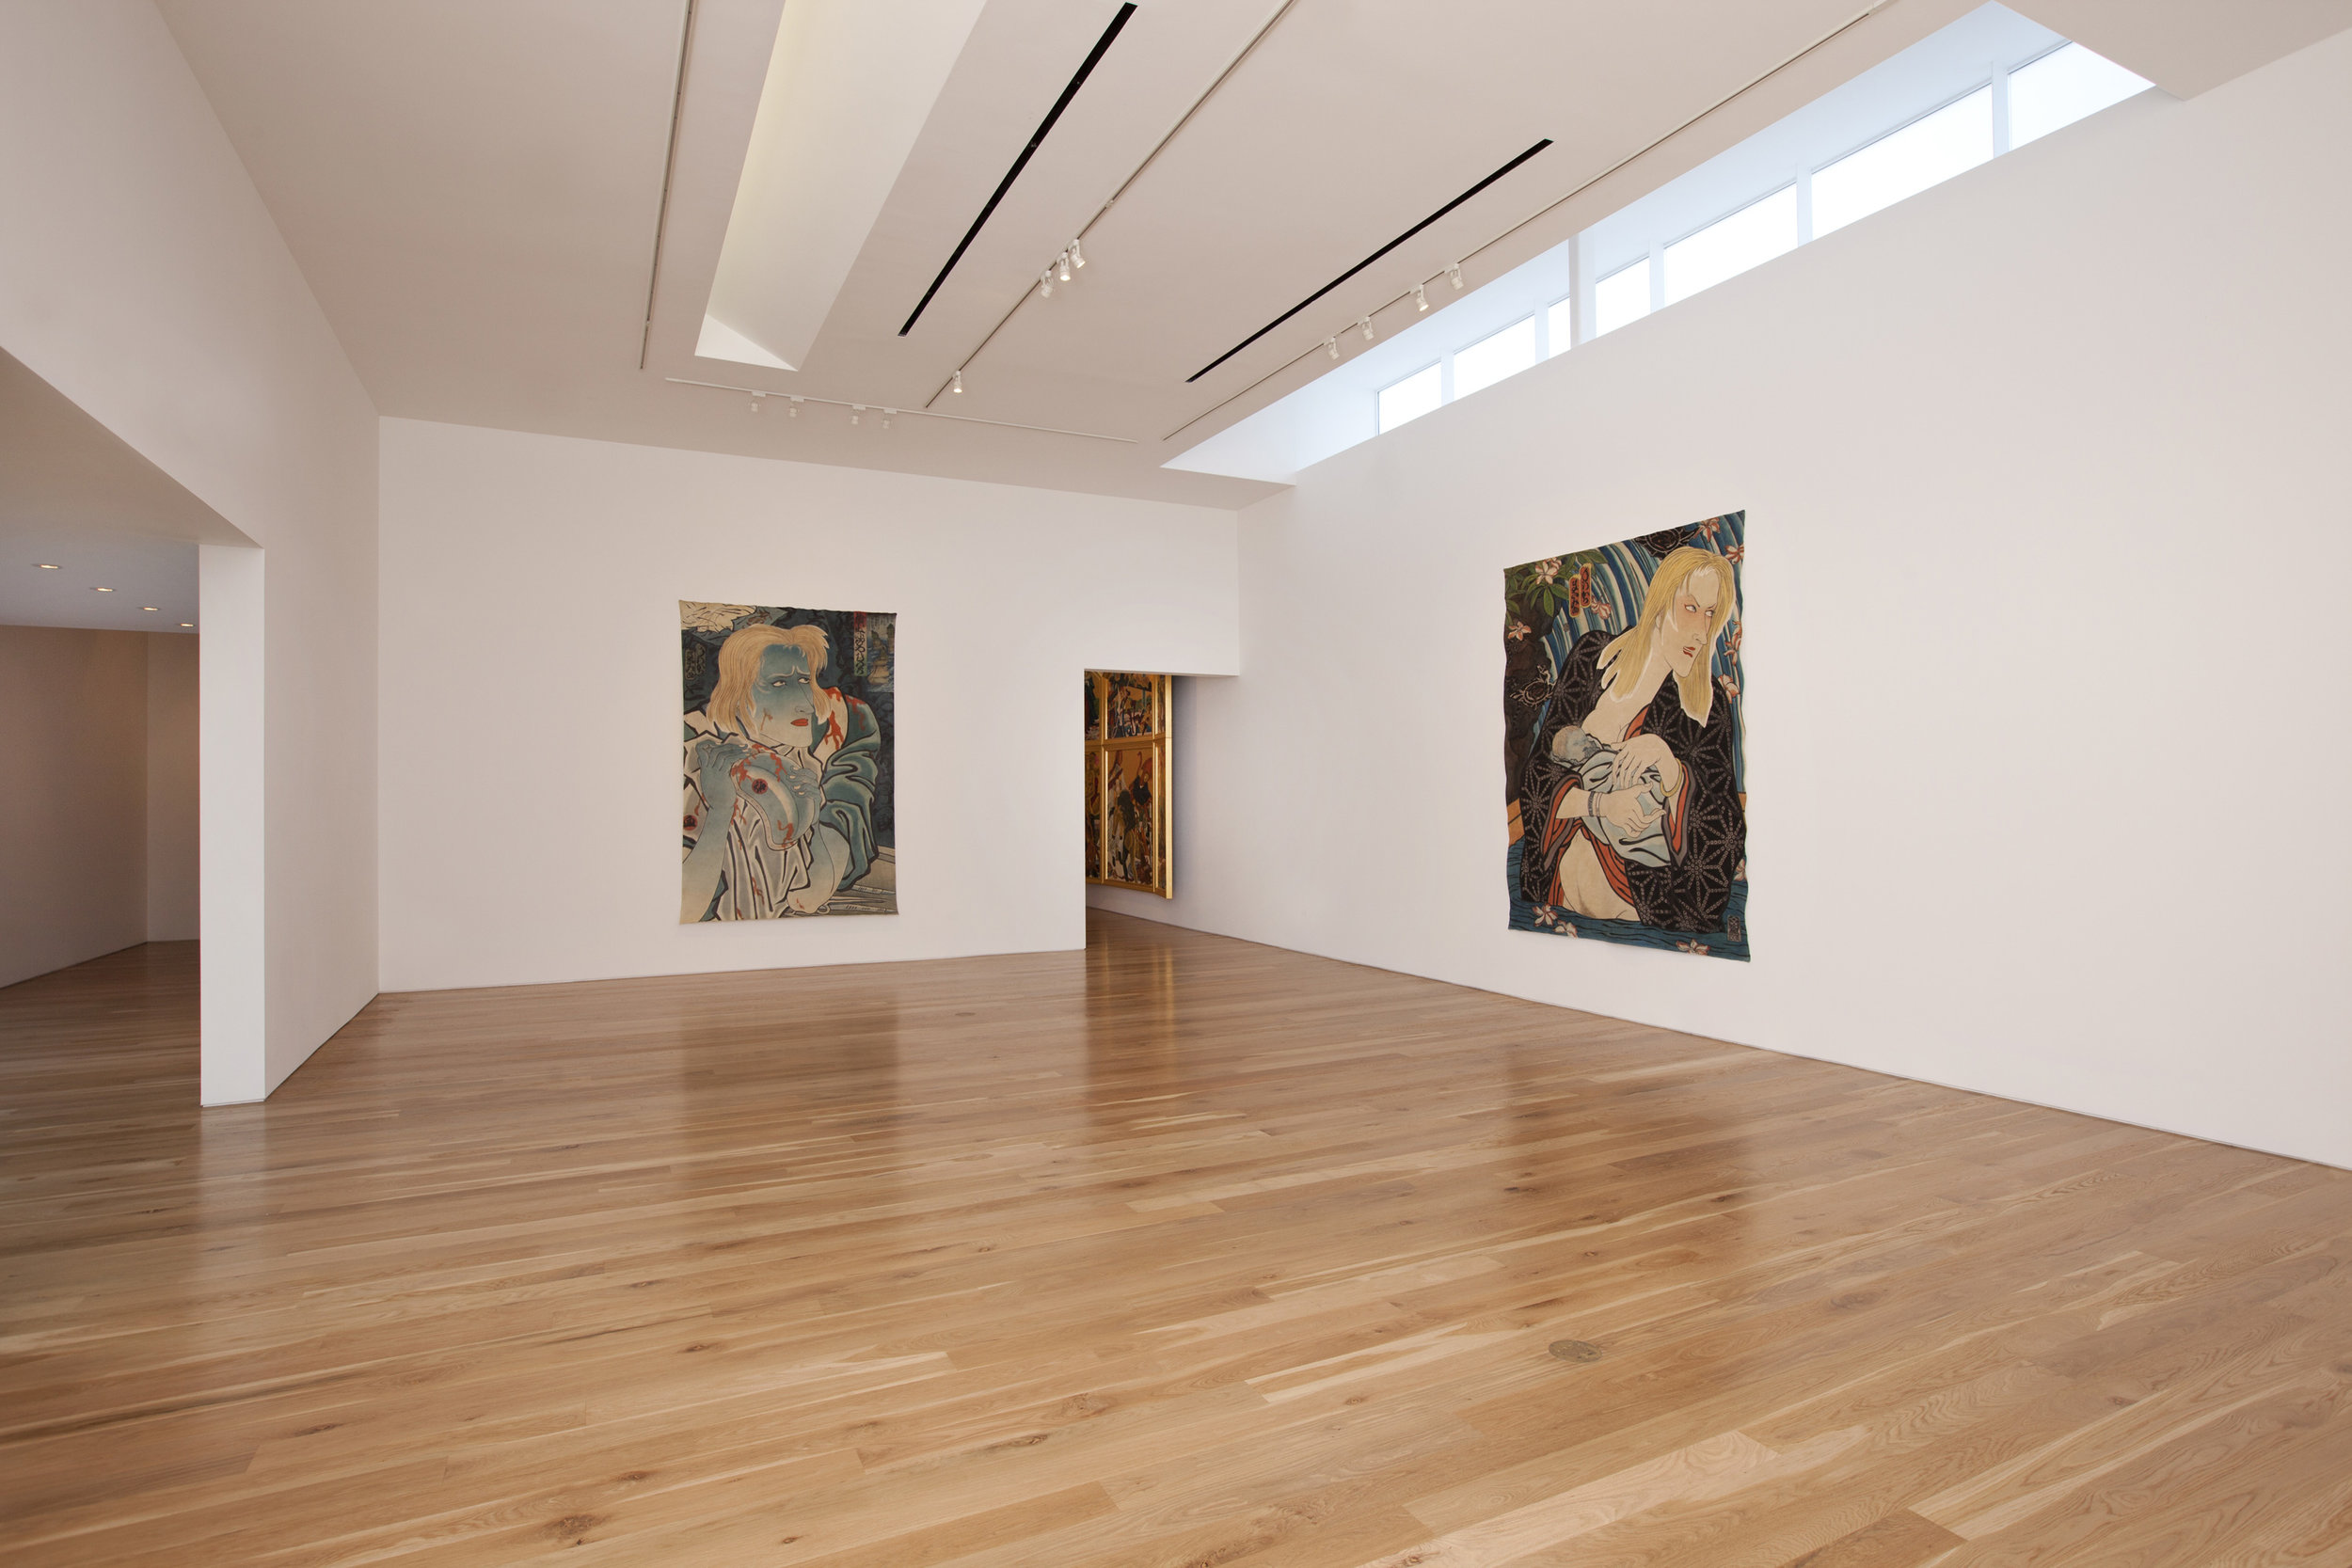 Masami Teraoka, The Cloisters Last Super, installation view, 2012.